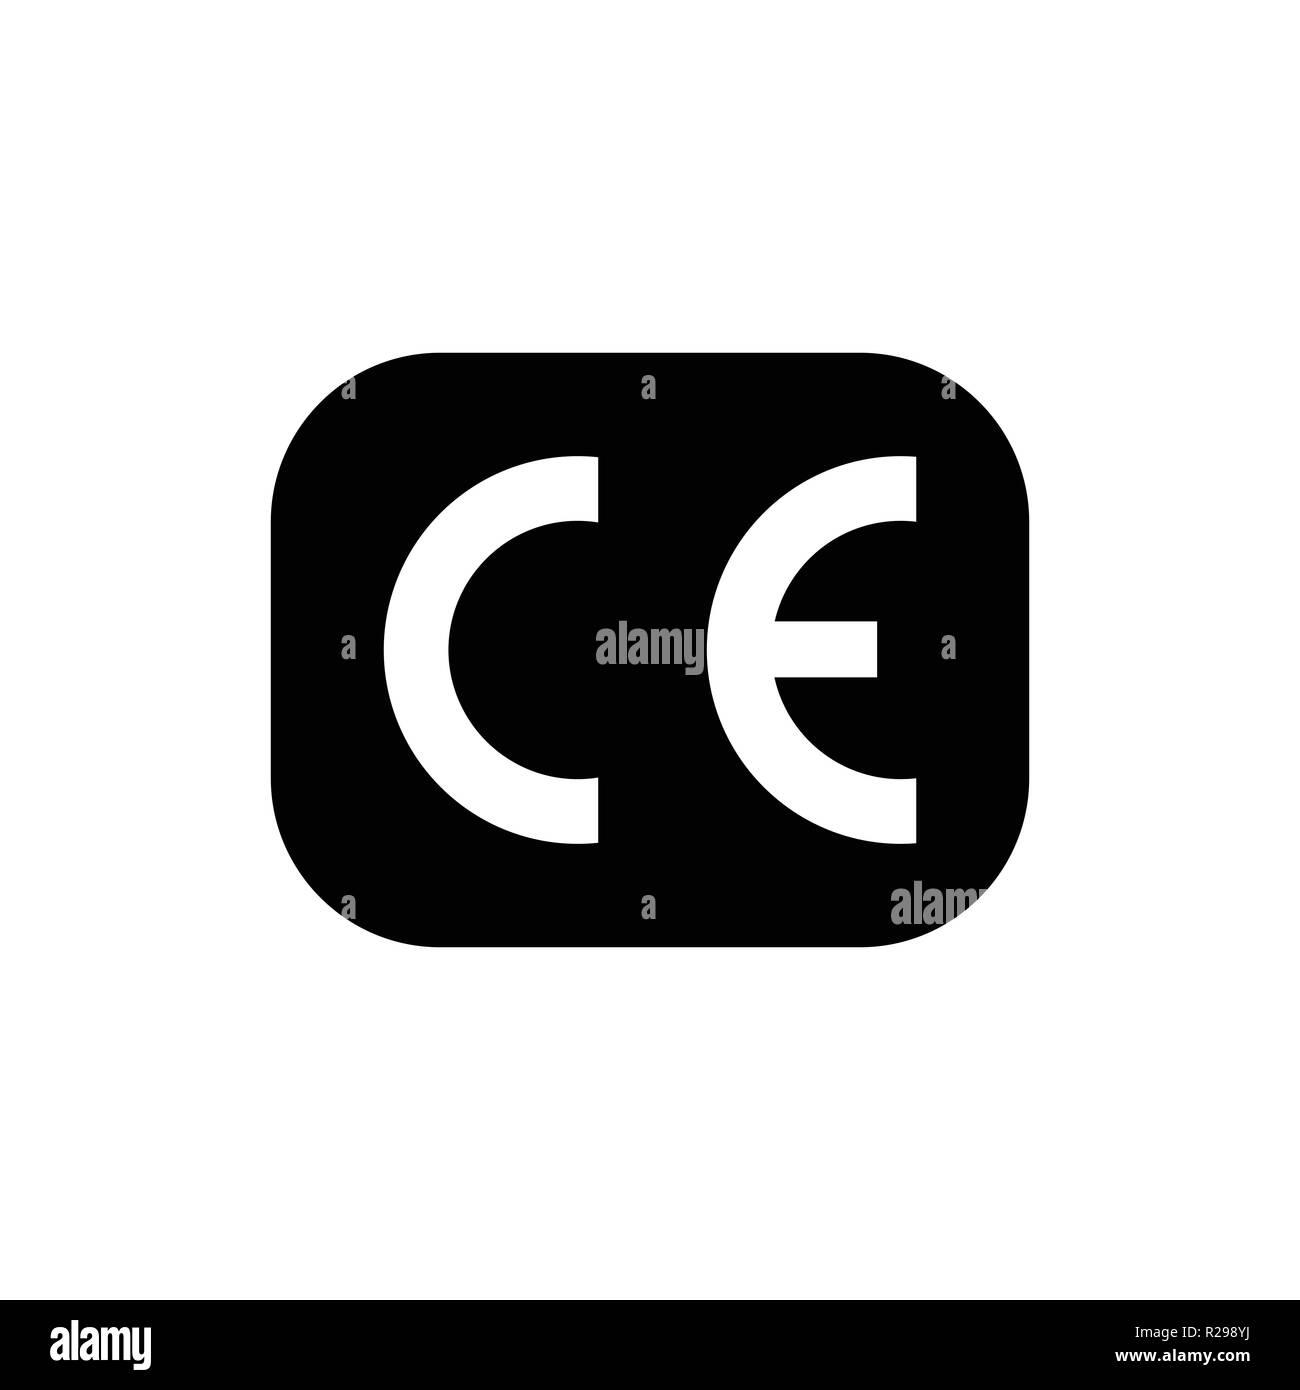 CE mark symbol. European Conformity certification mark. Vector illustration, - Stock Image